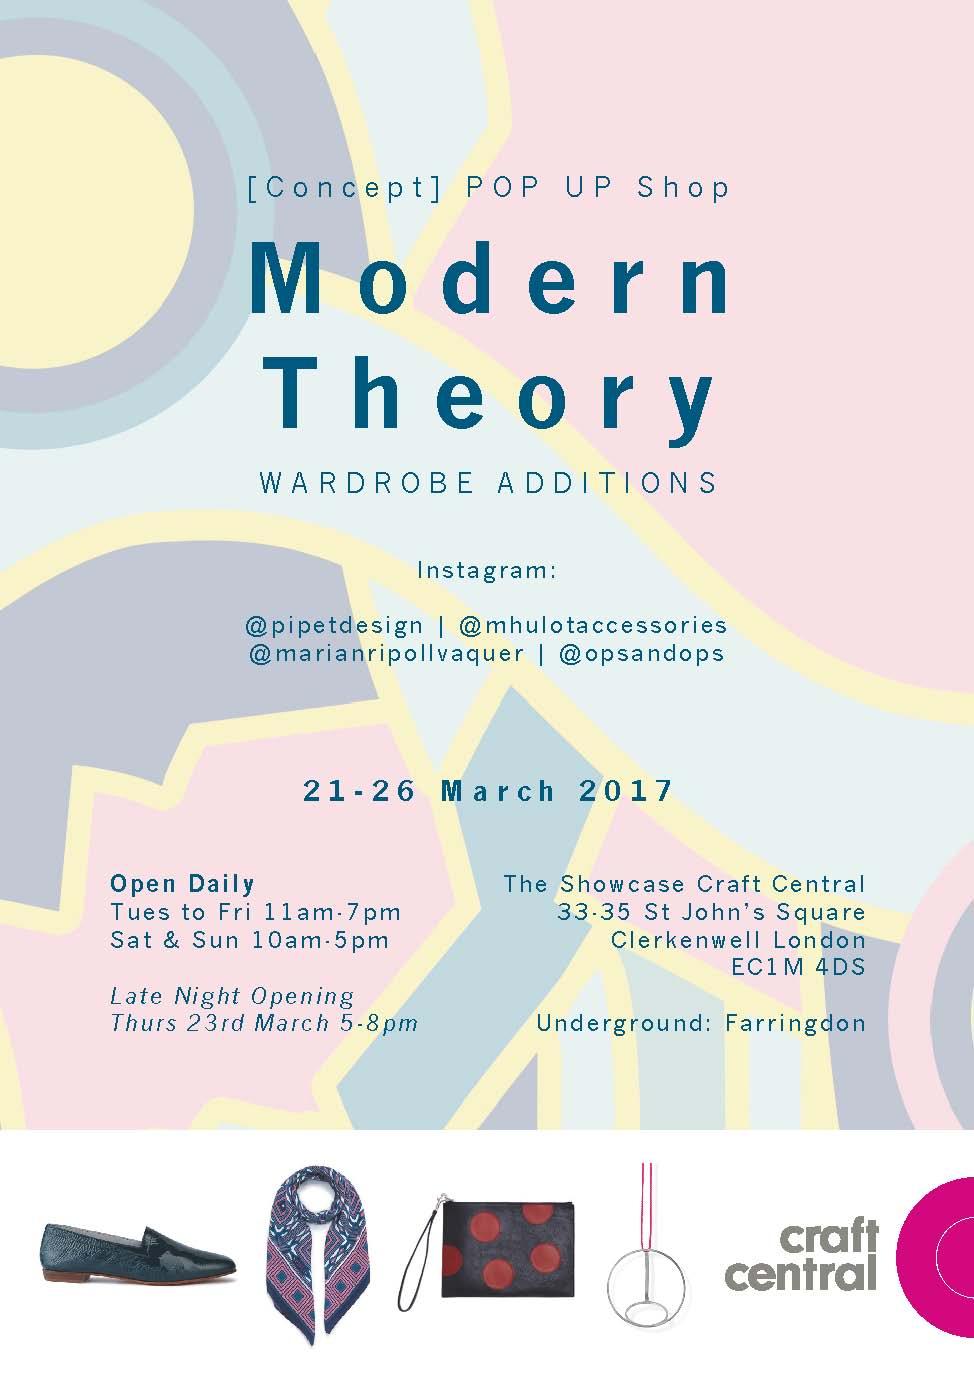 Modern Theory pop-up flyer